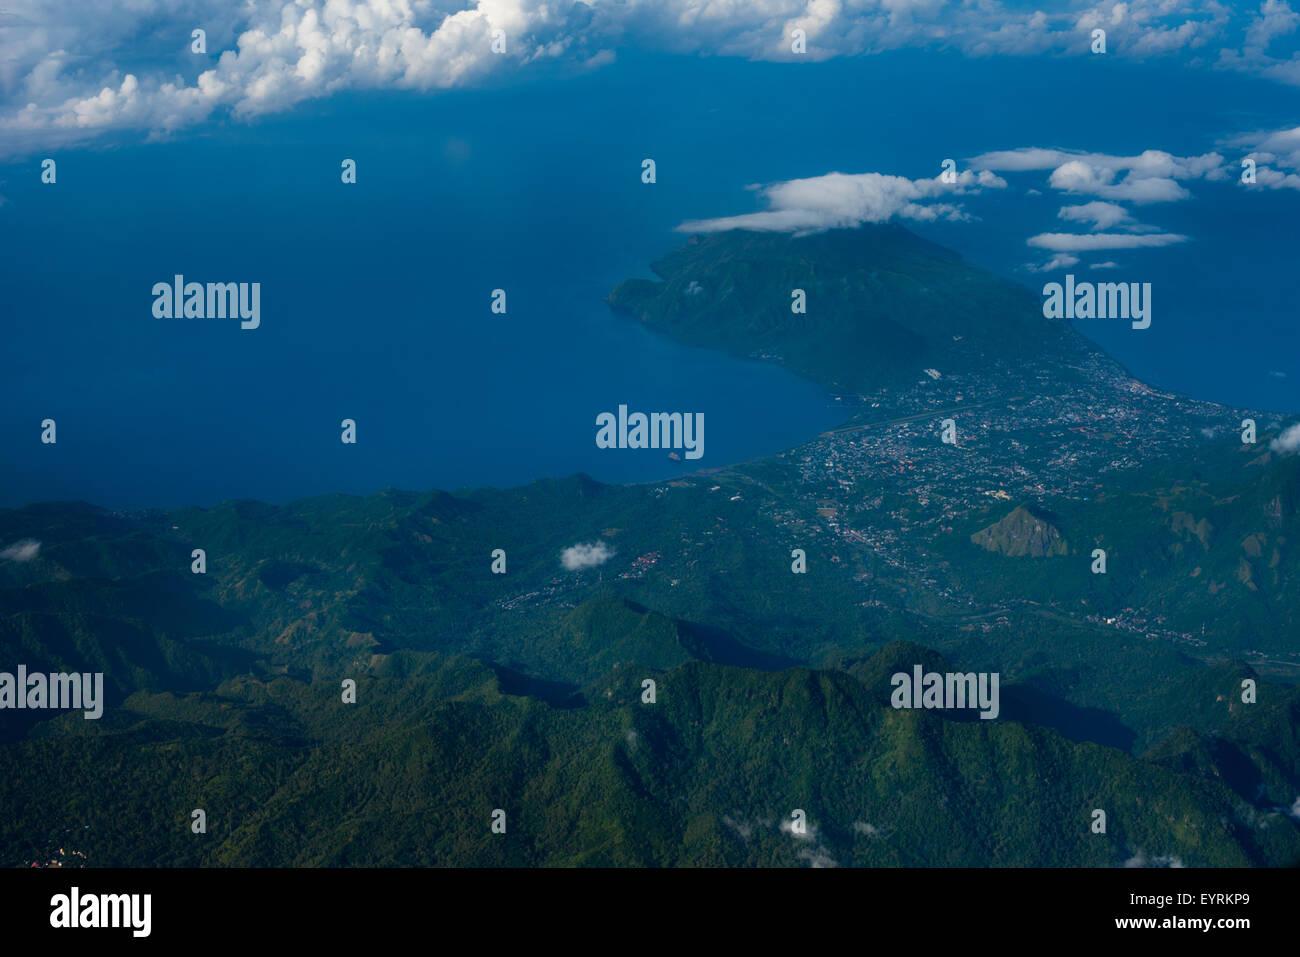 Aerial view of Ende city on the edge of Savu Sea. © Reynold Sumayku - Stock Image